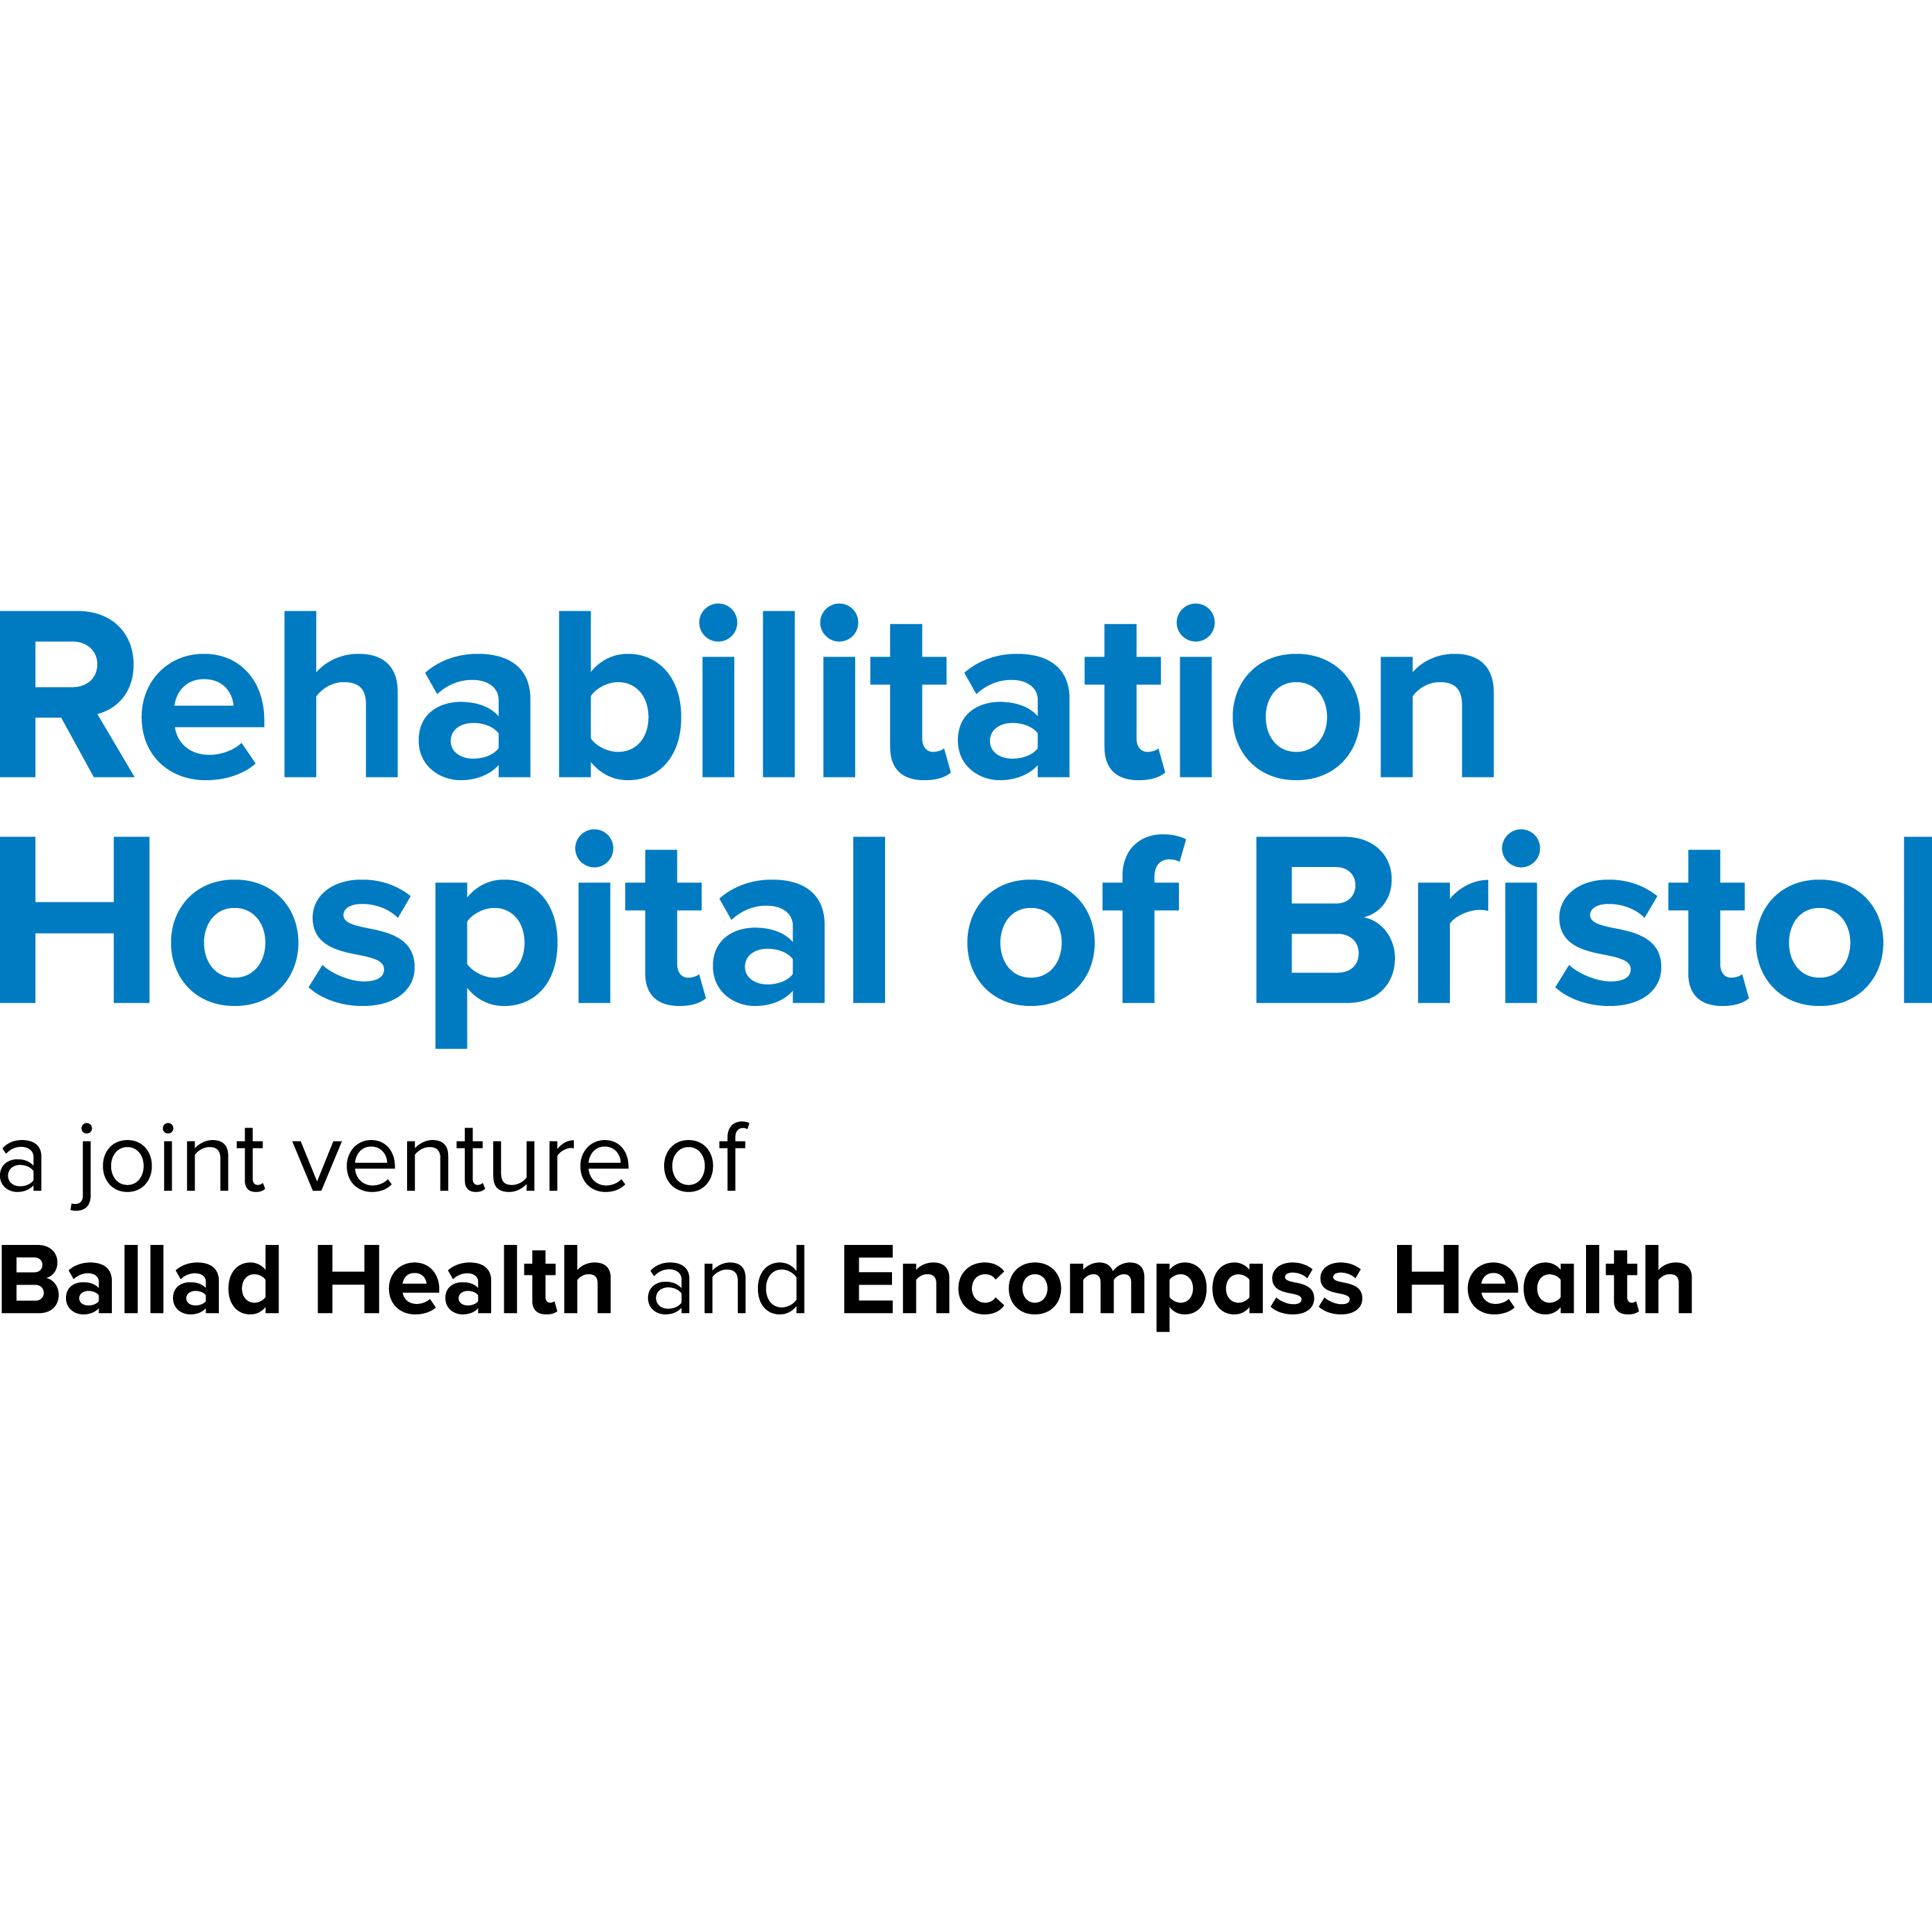 Rehabilitation Hospital of Bristol, a joint venture of Ballad Health and Encompass Health